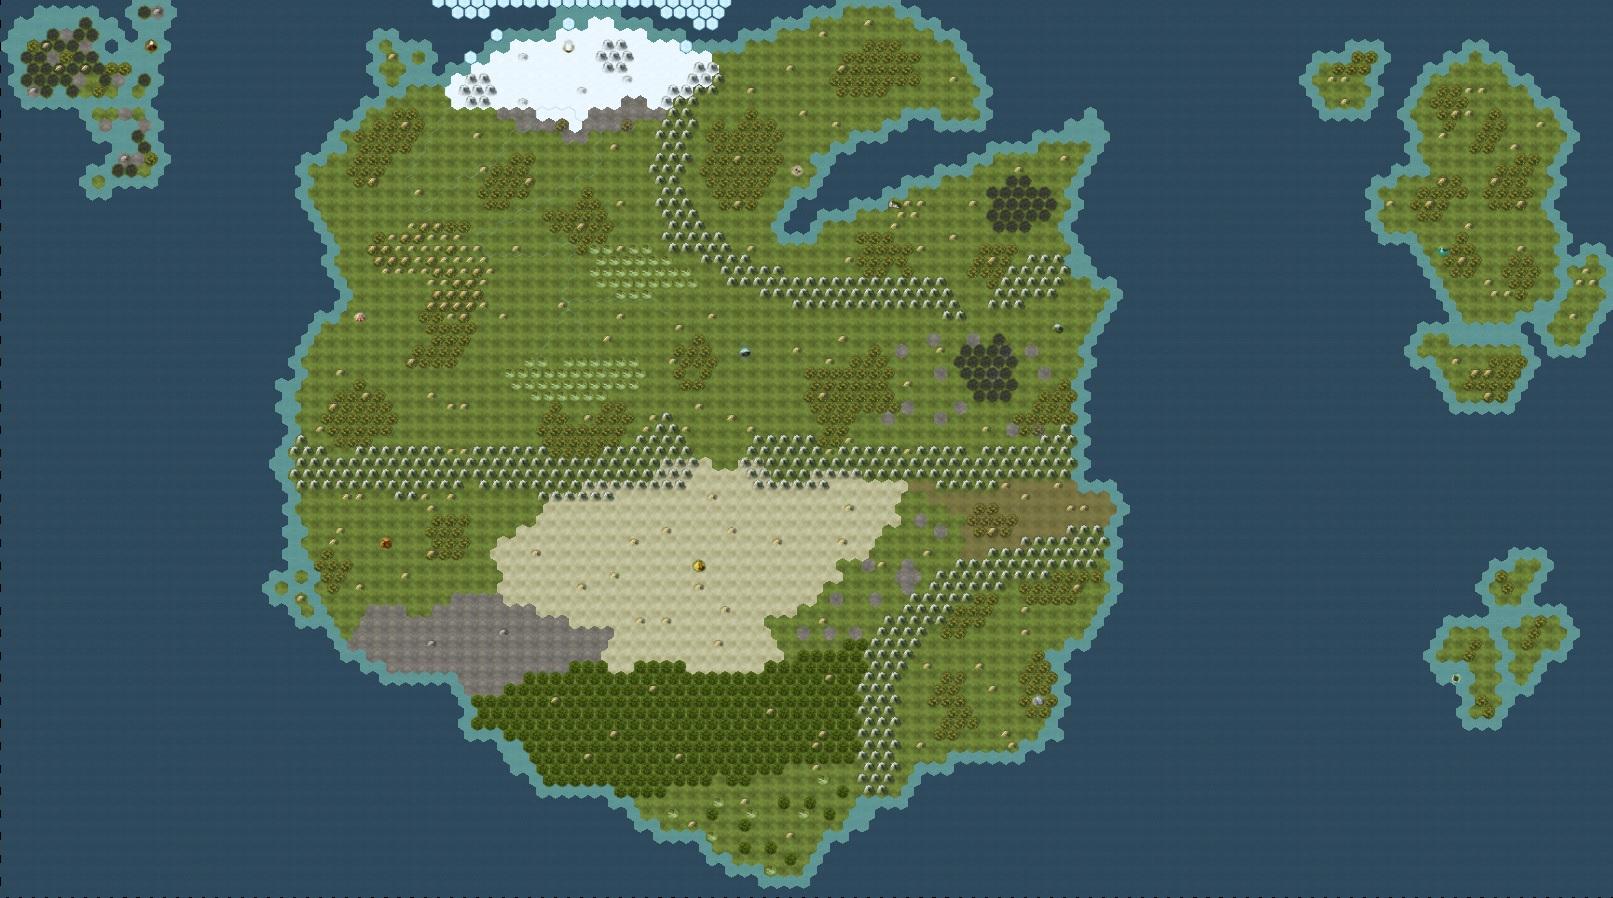 Top Map Of Runeterra Galleries - Printable Map - New - bartosandrini.com